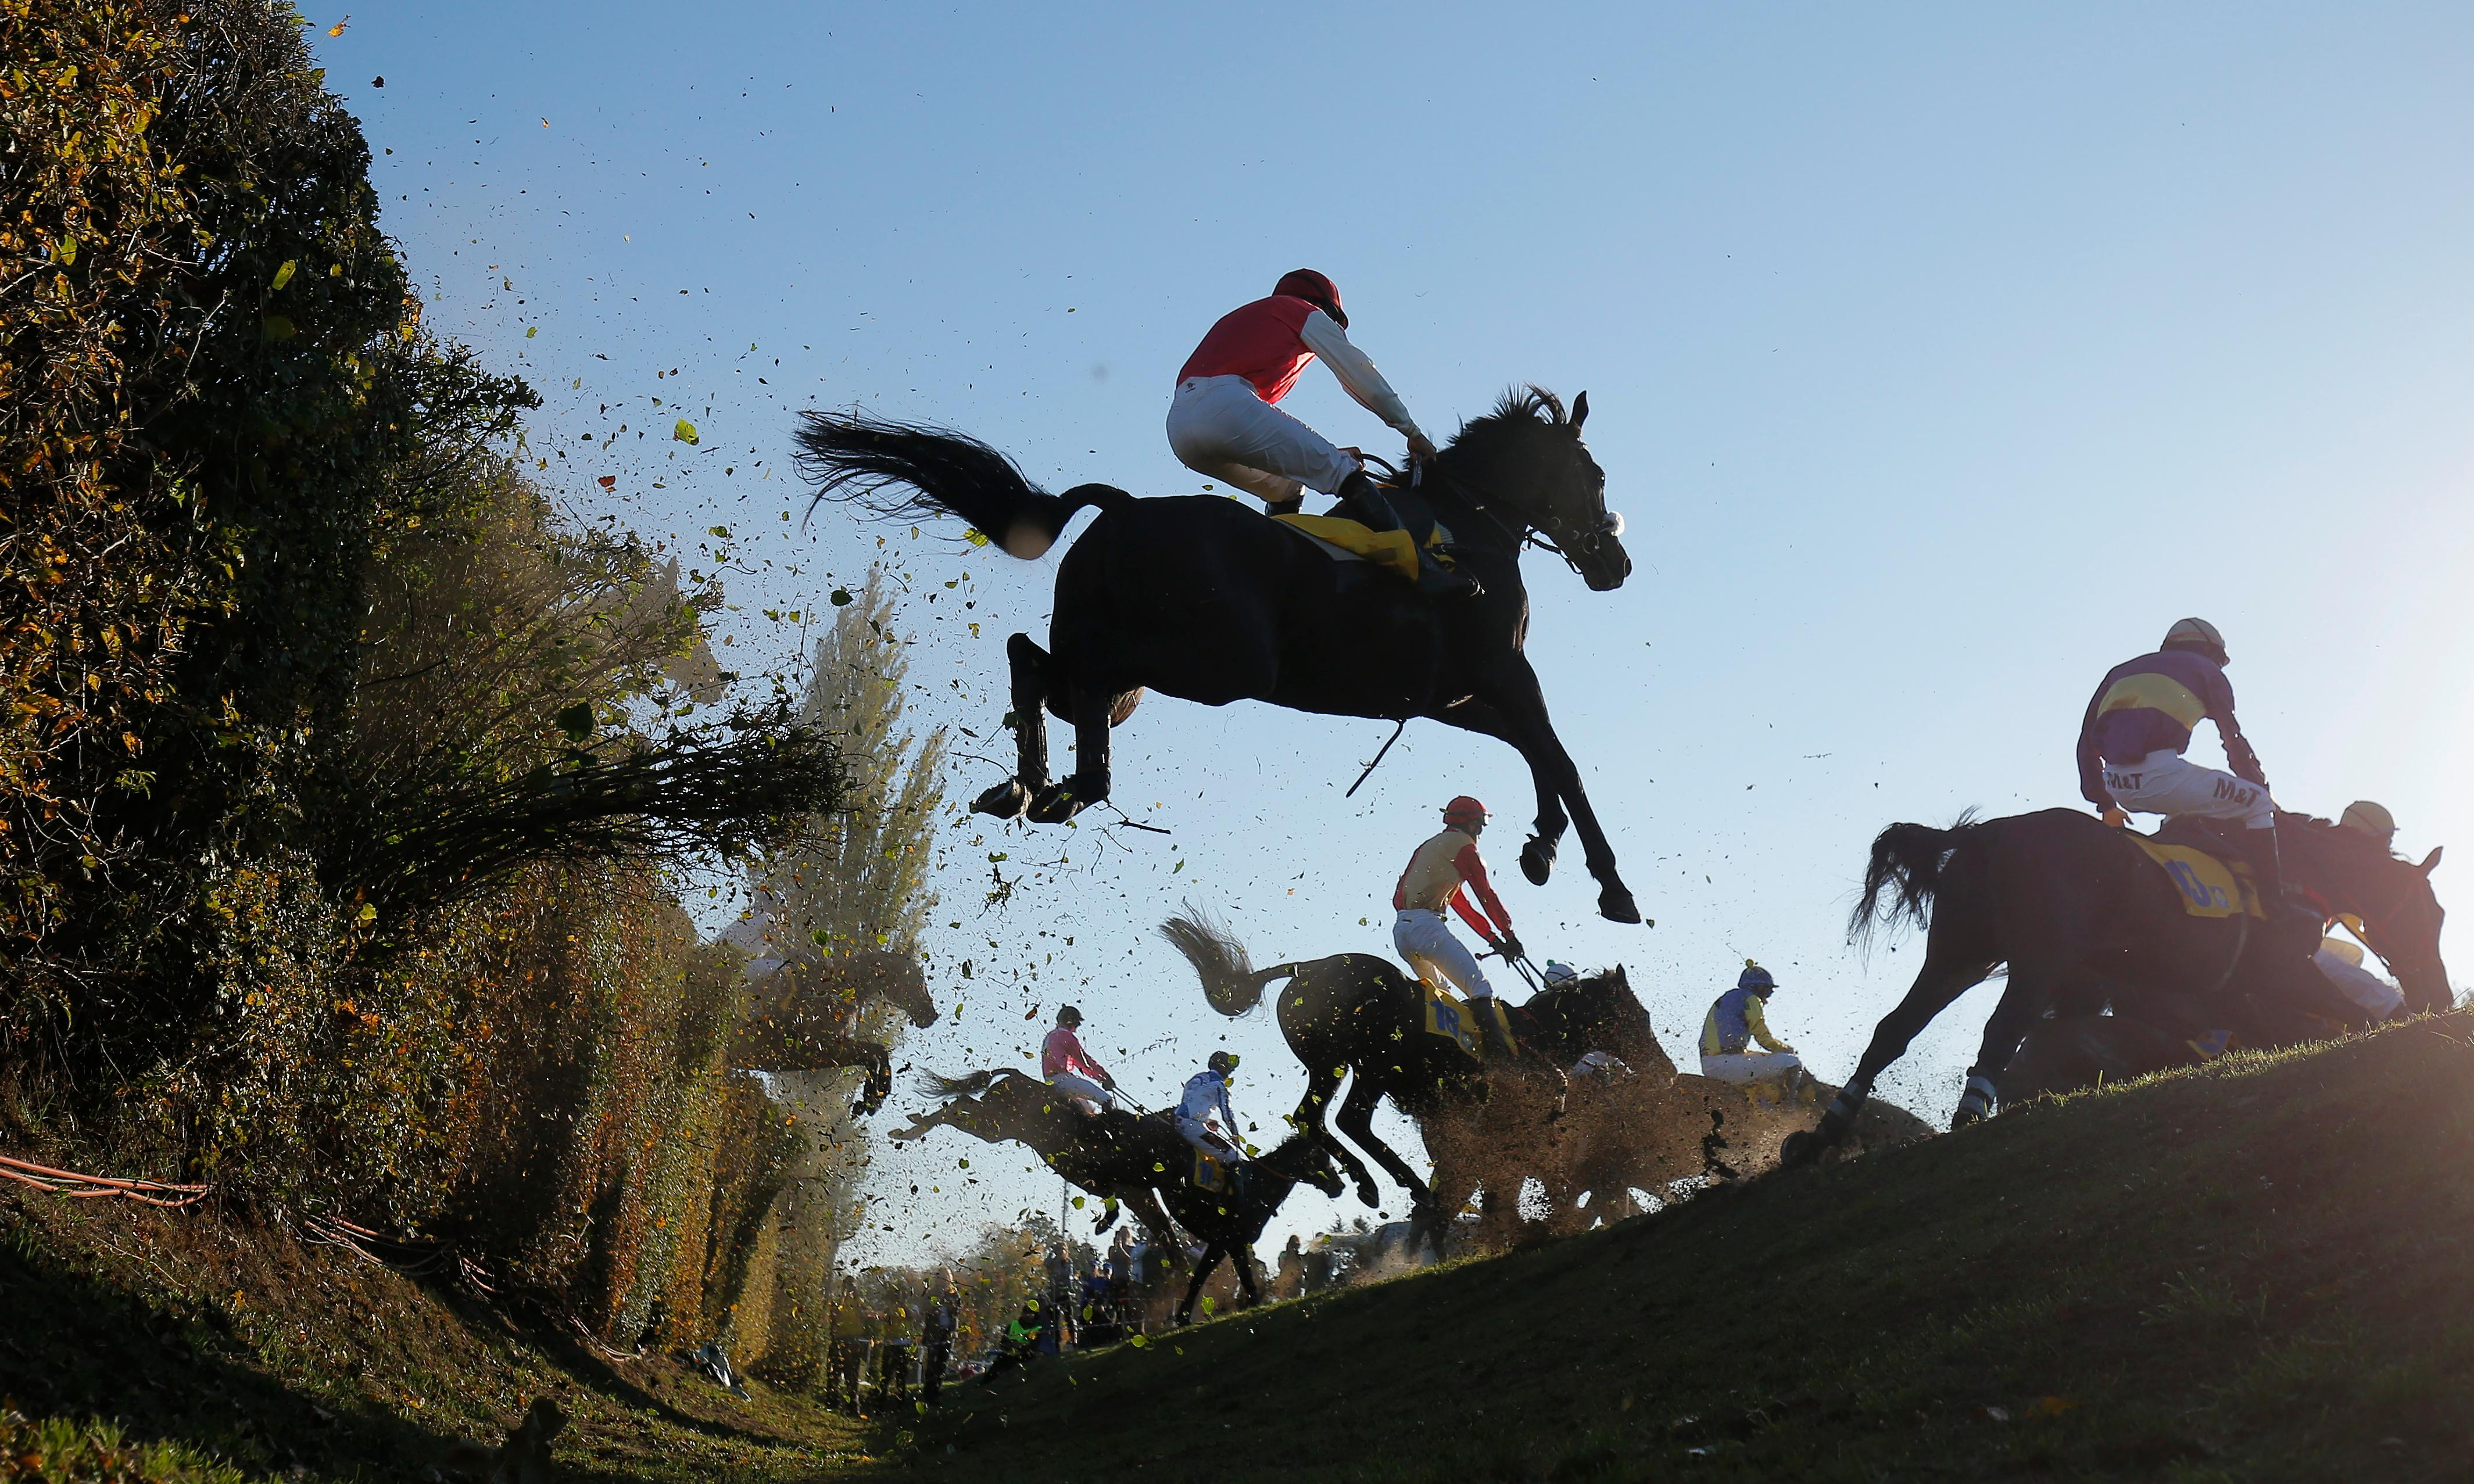 Grand Pardubice Steeplechase: the world's toughest horse race – a photo essay